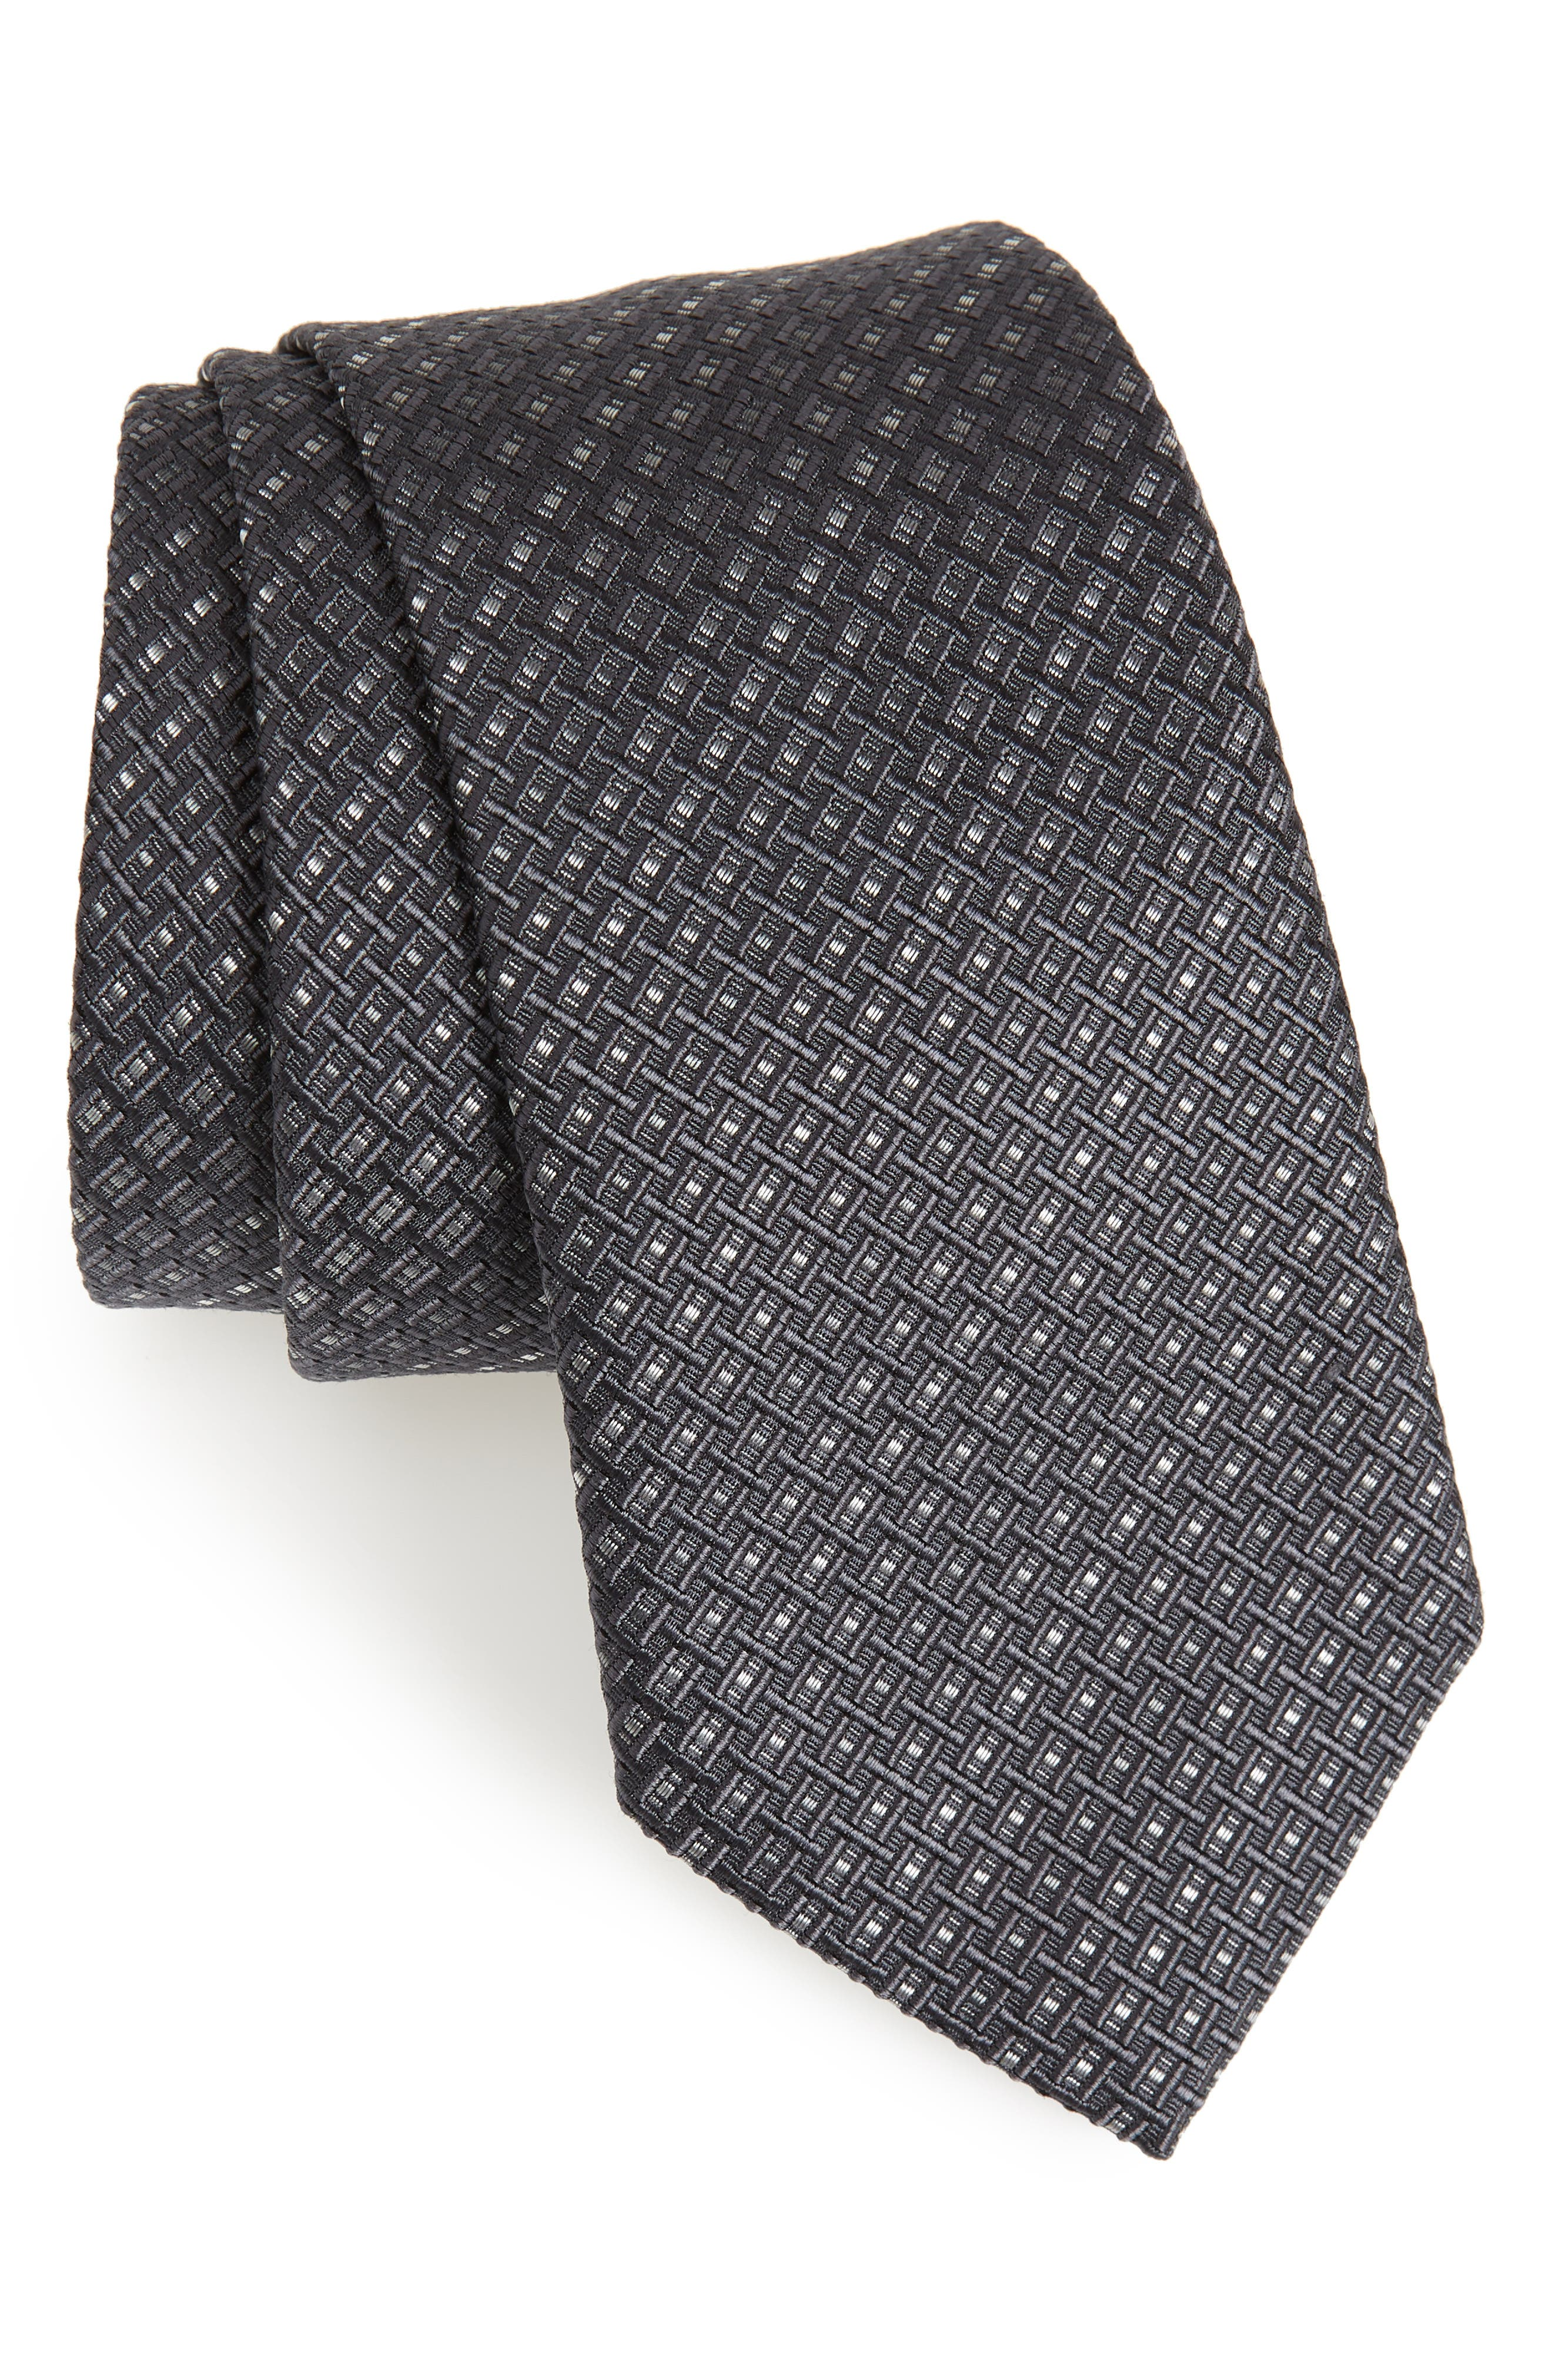 Alternate Image 1 Selected - Salvatore Ferragamo Este Solid Silk & Cotton Tie